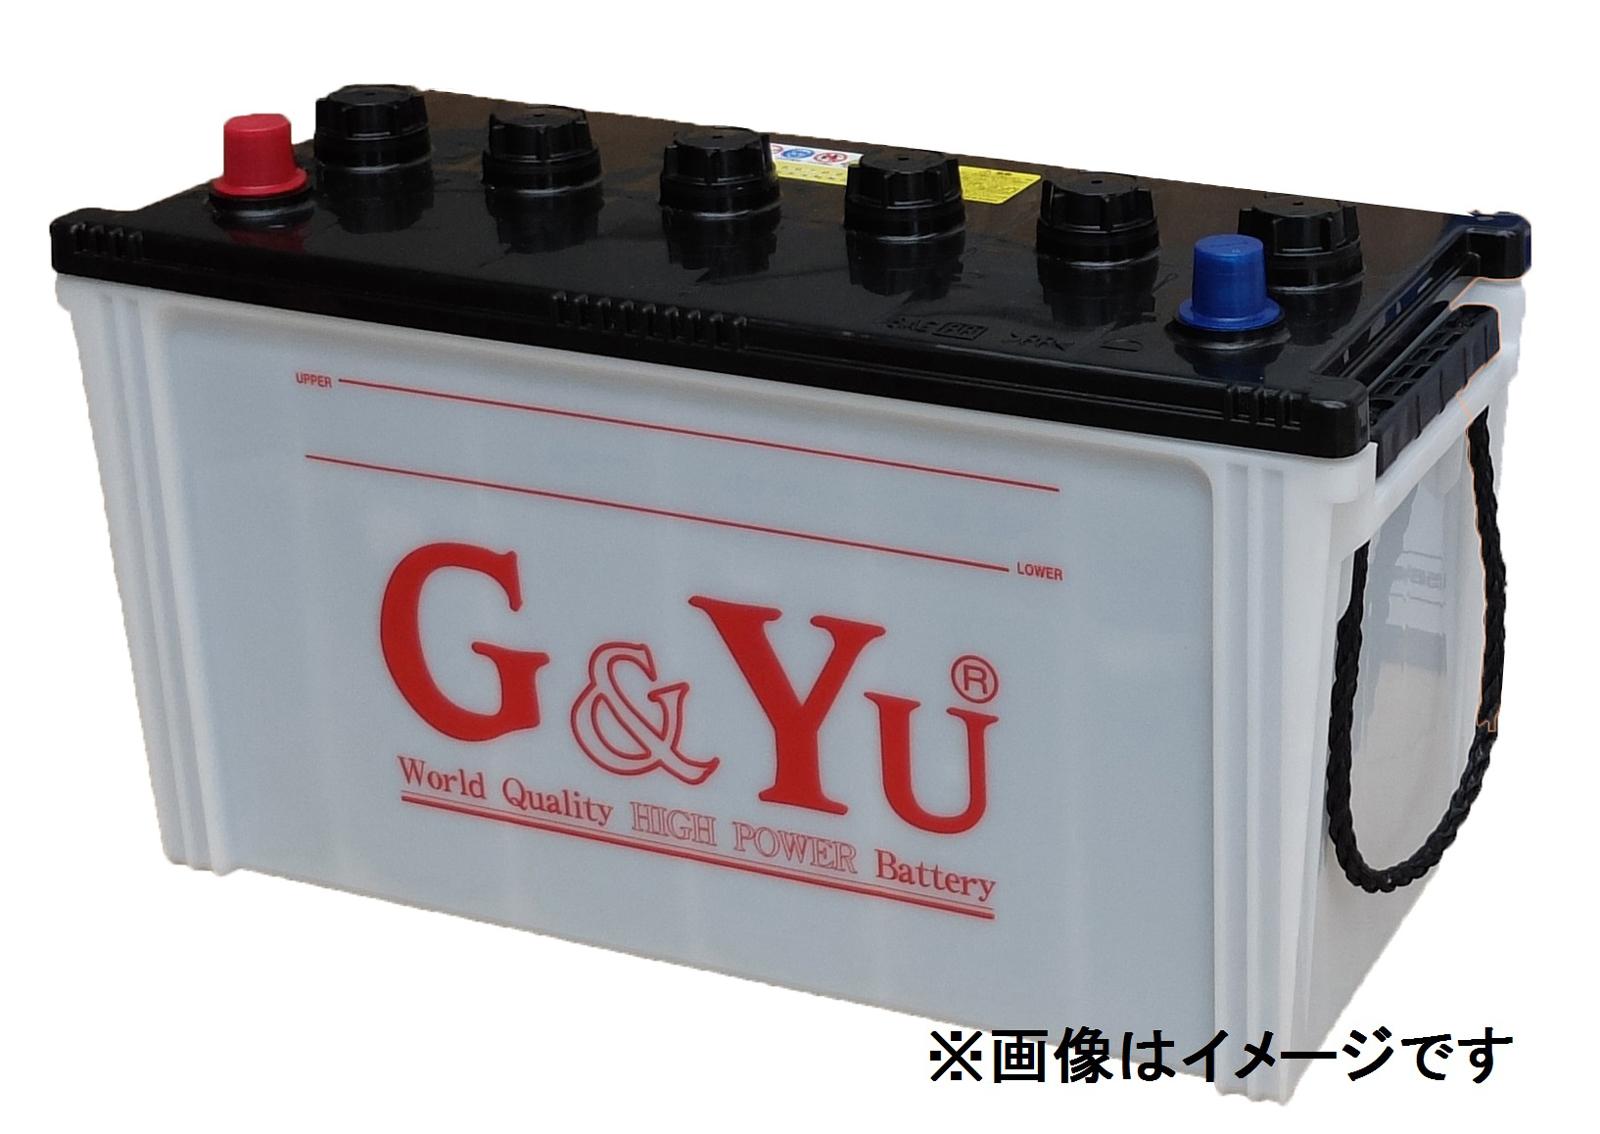 G&Yu バッテリー HD-130E41L